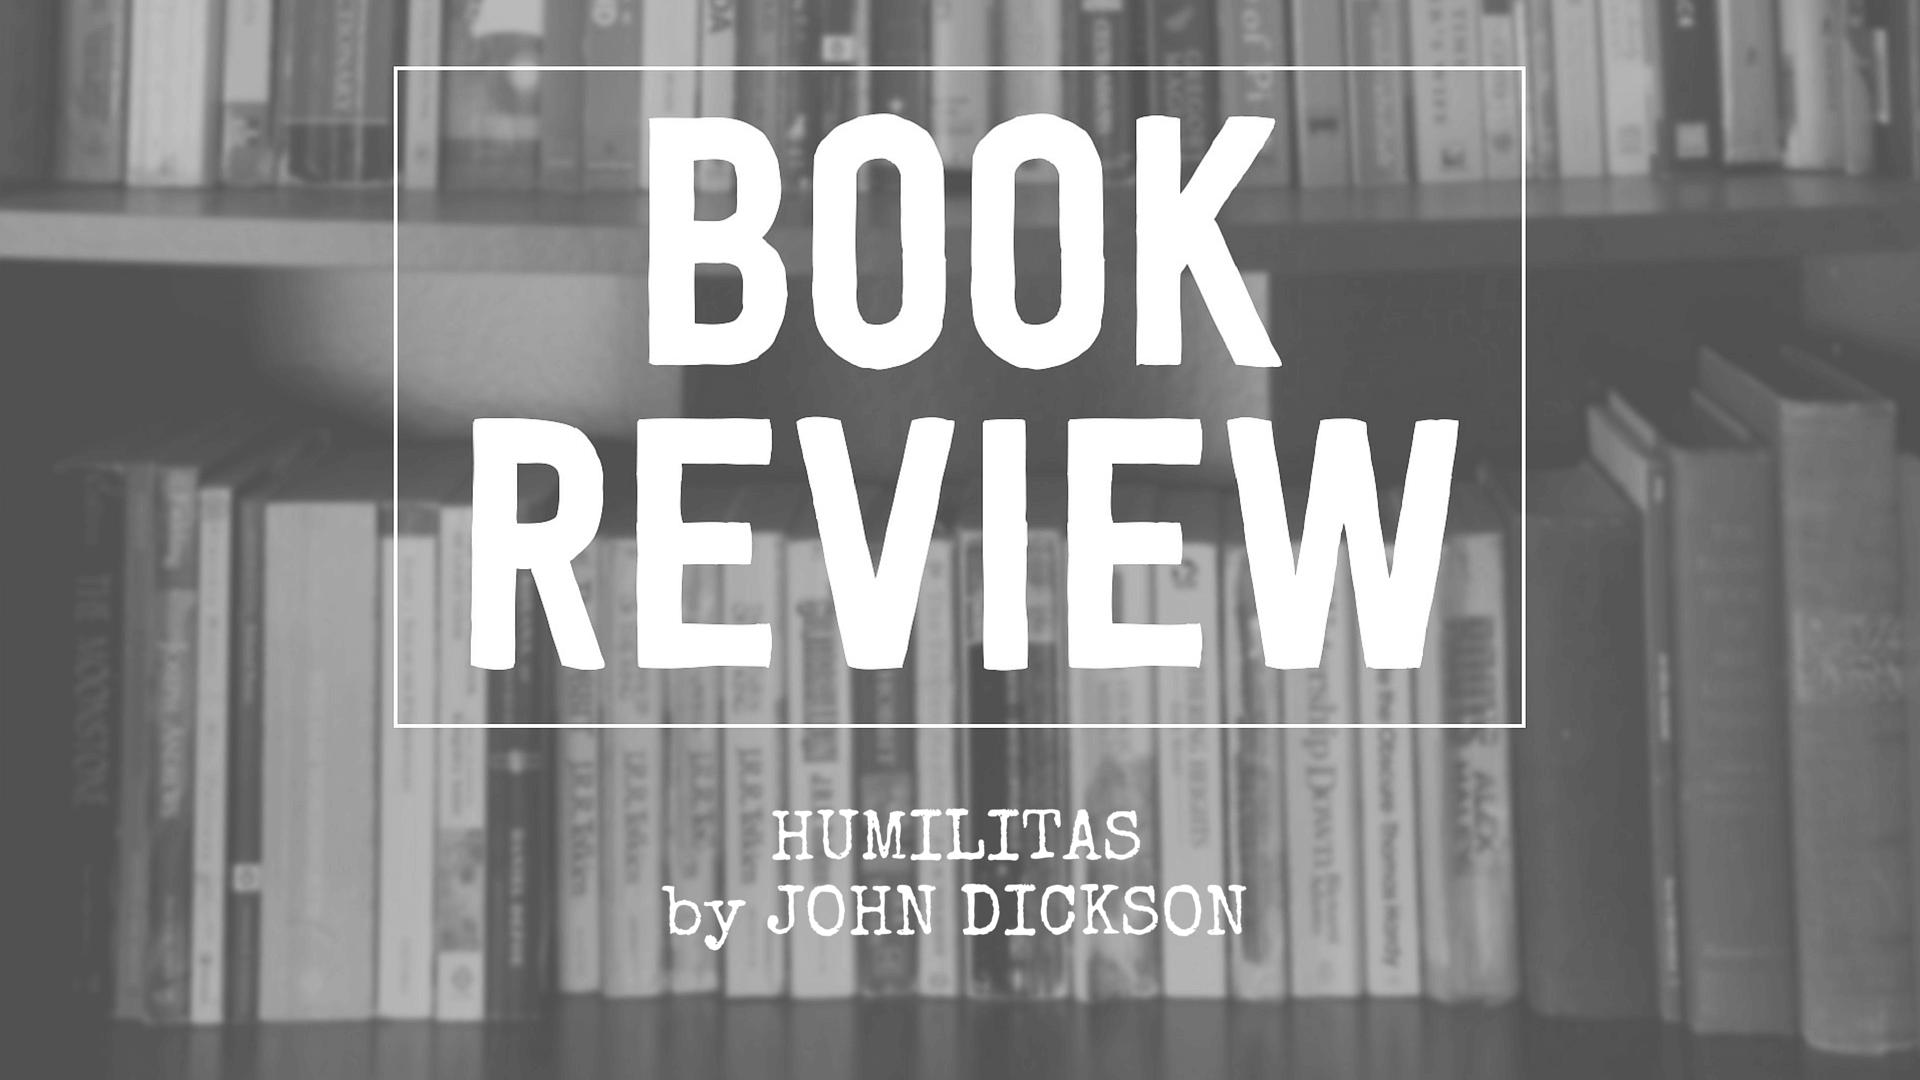 Humilitas by John Dickson